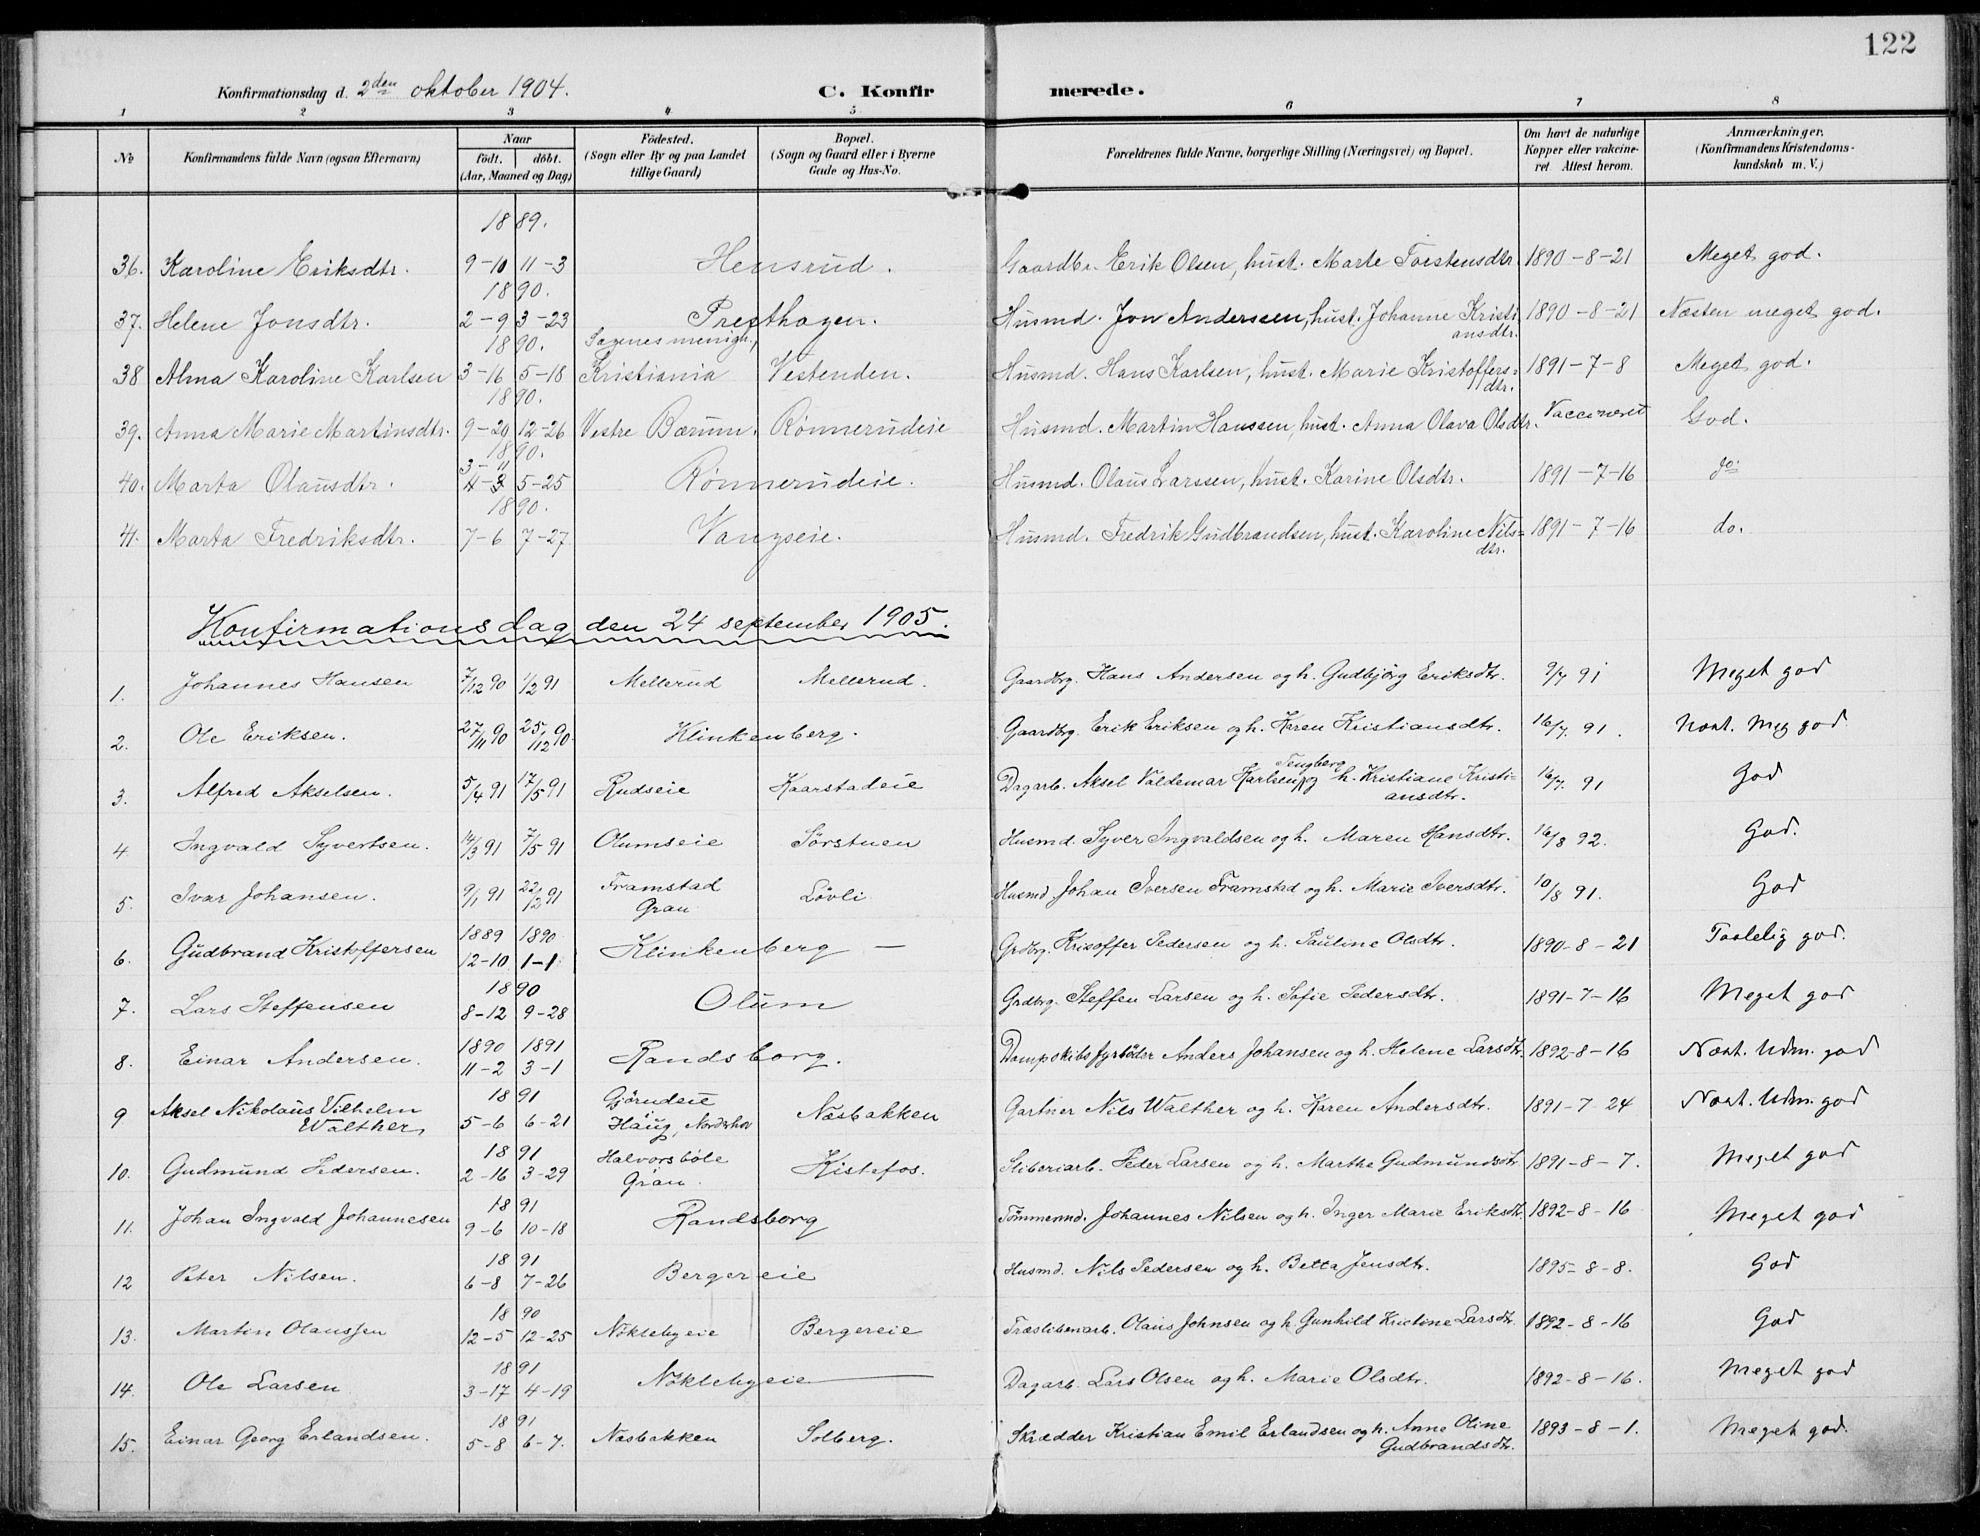 SAH, Jevnaker prestekontor, Ministerialbok nr. 11, 1902-1913, s. 122